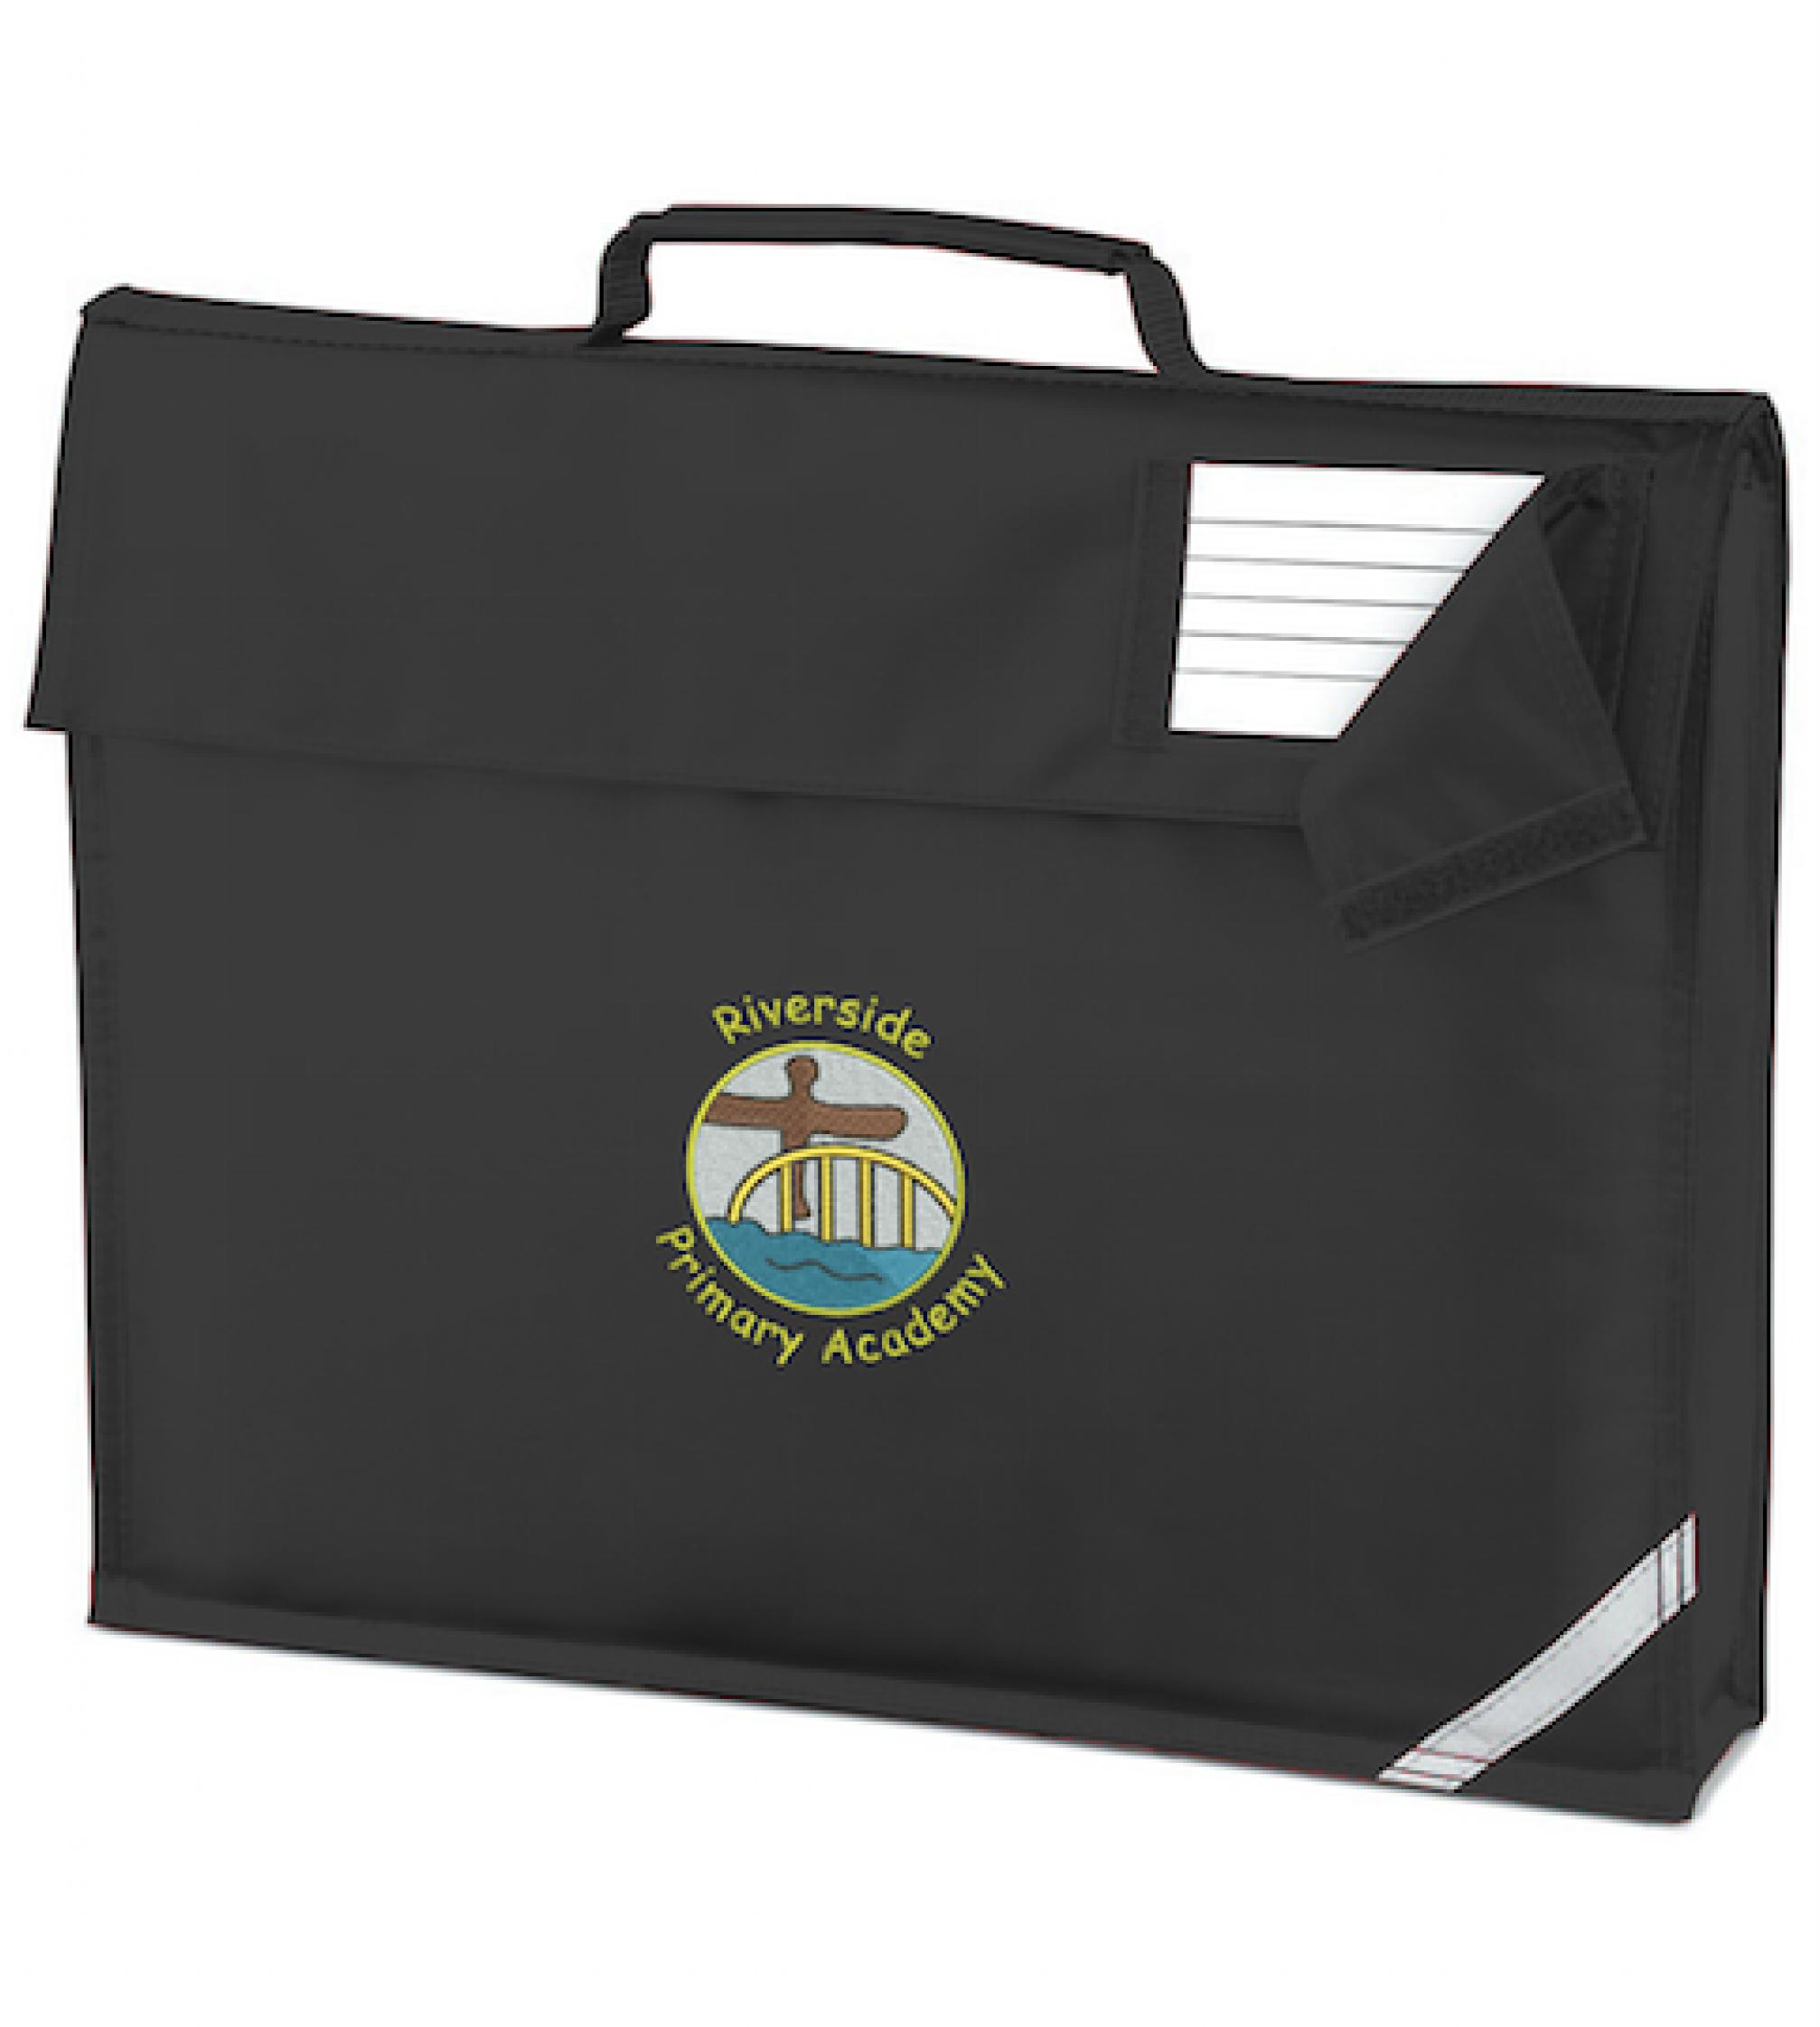 Riverside Academy Book Bag